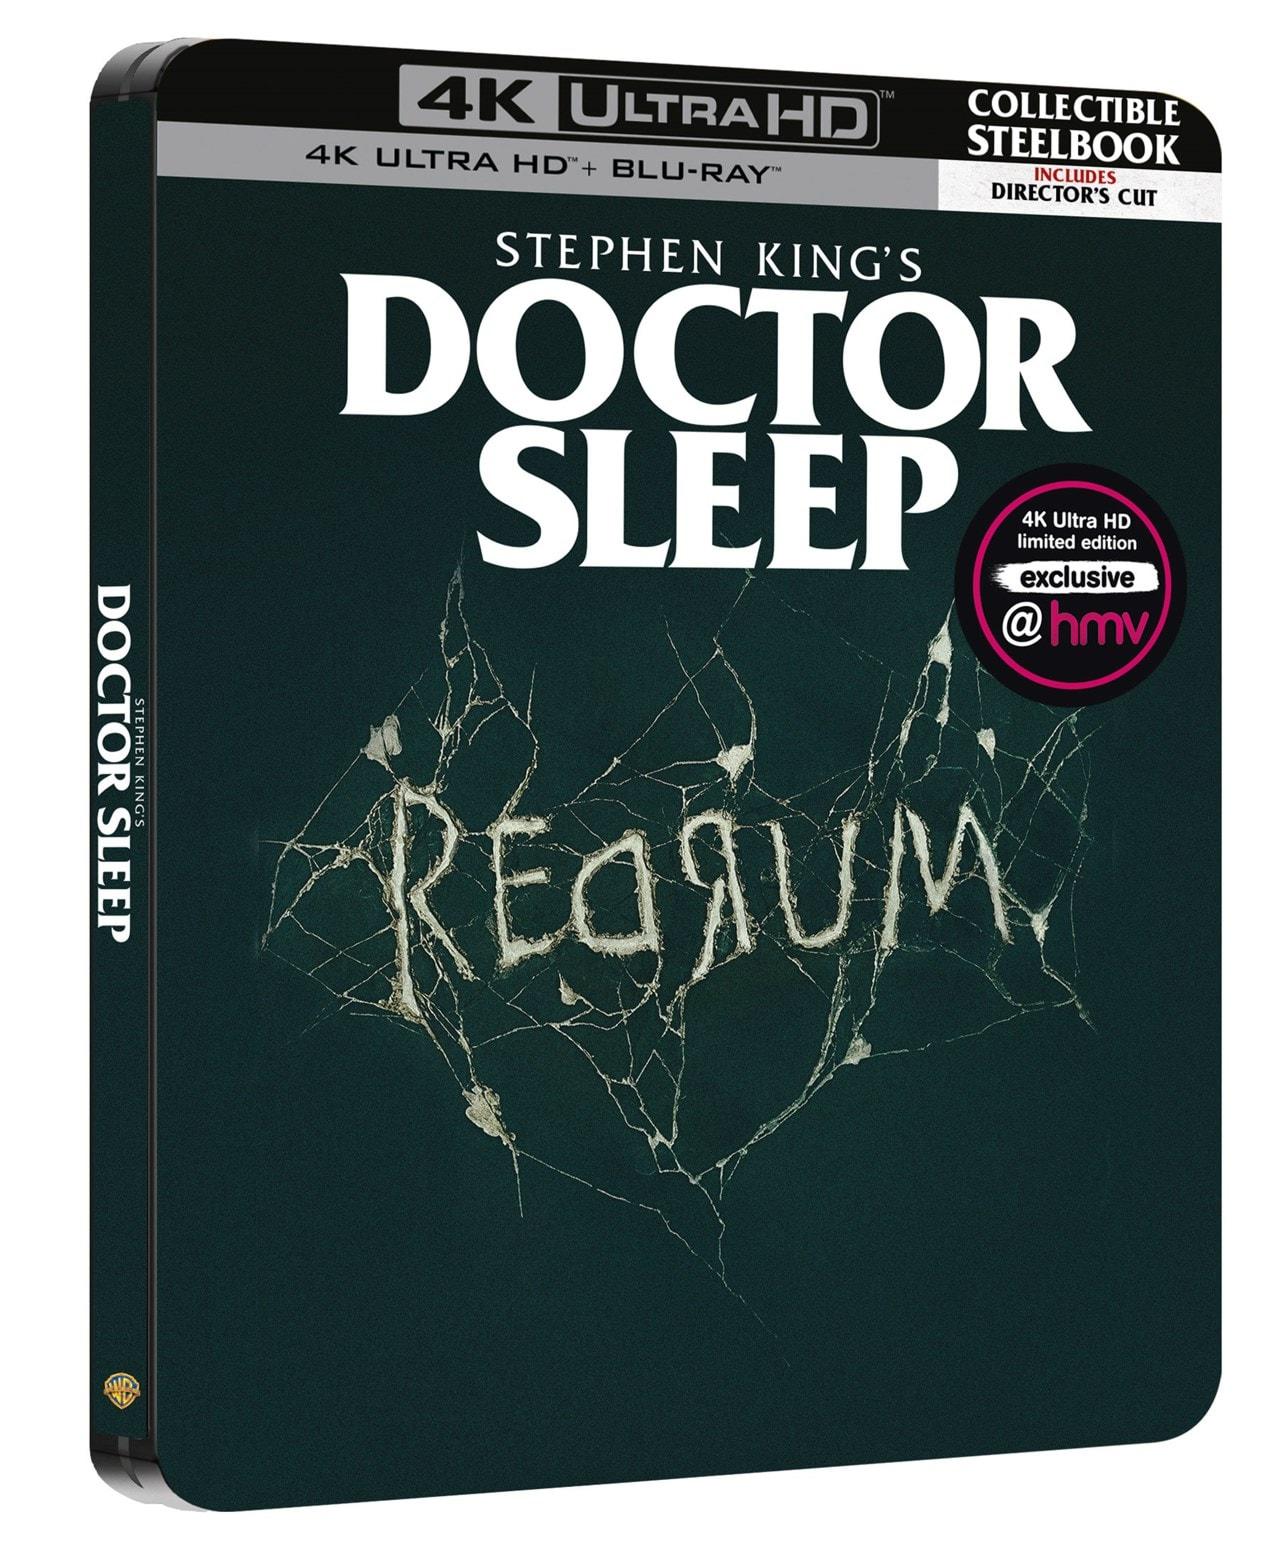 Doctor Sleep (hmv Exclusive) Limited Edition 3-Disc Director's Cut Steelbook - 2